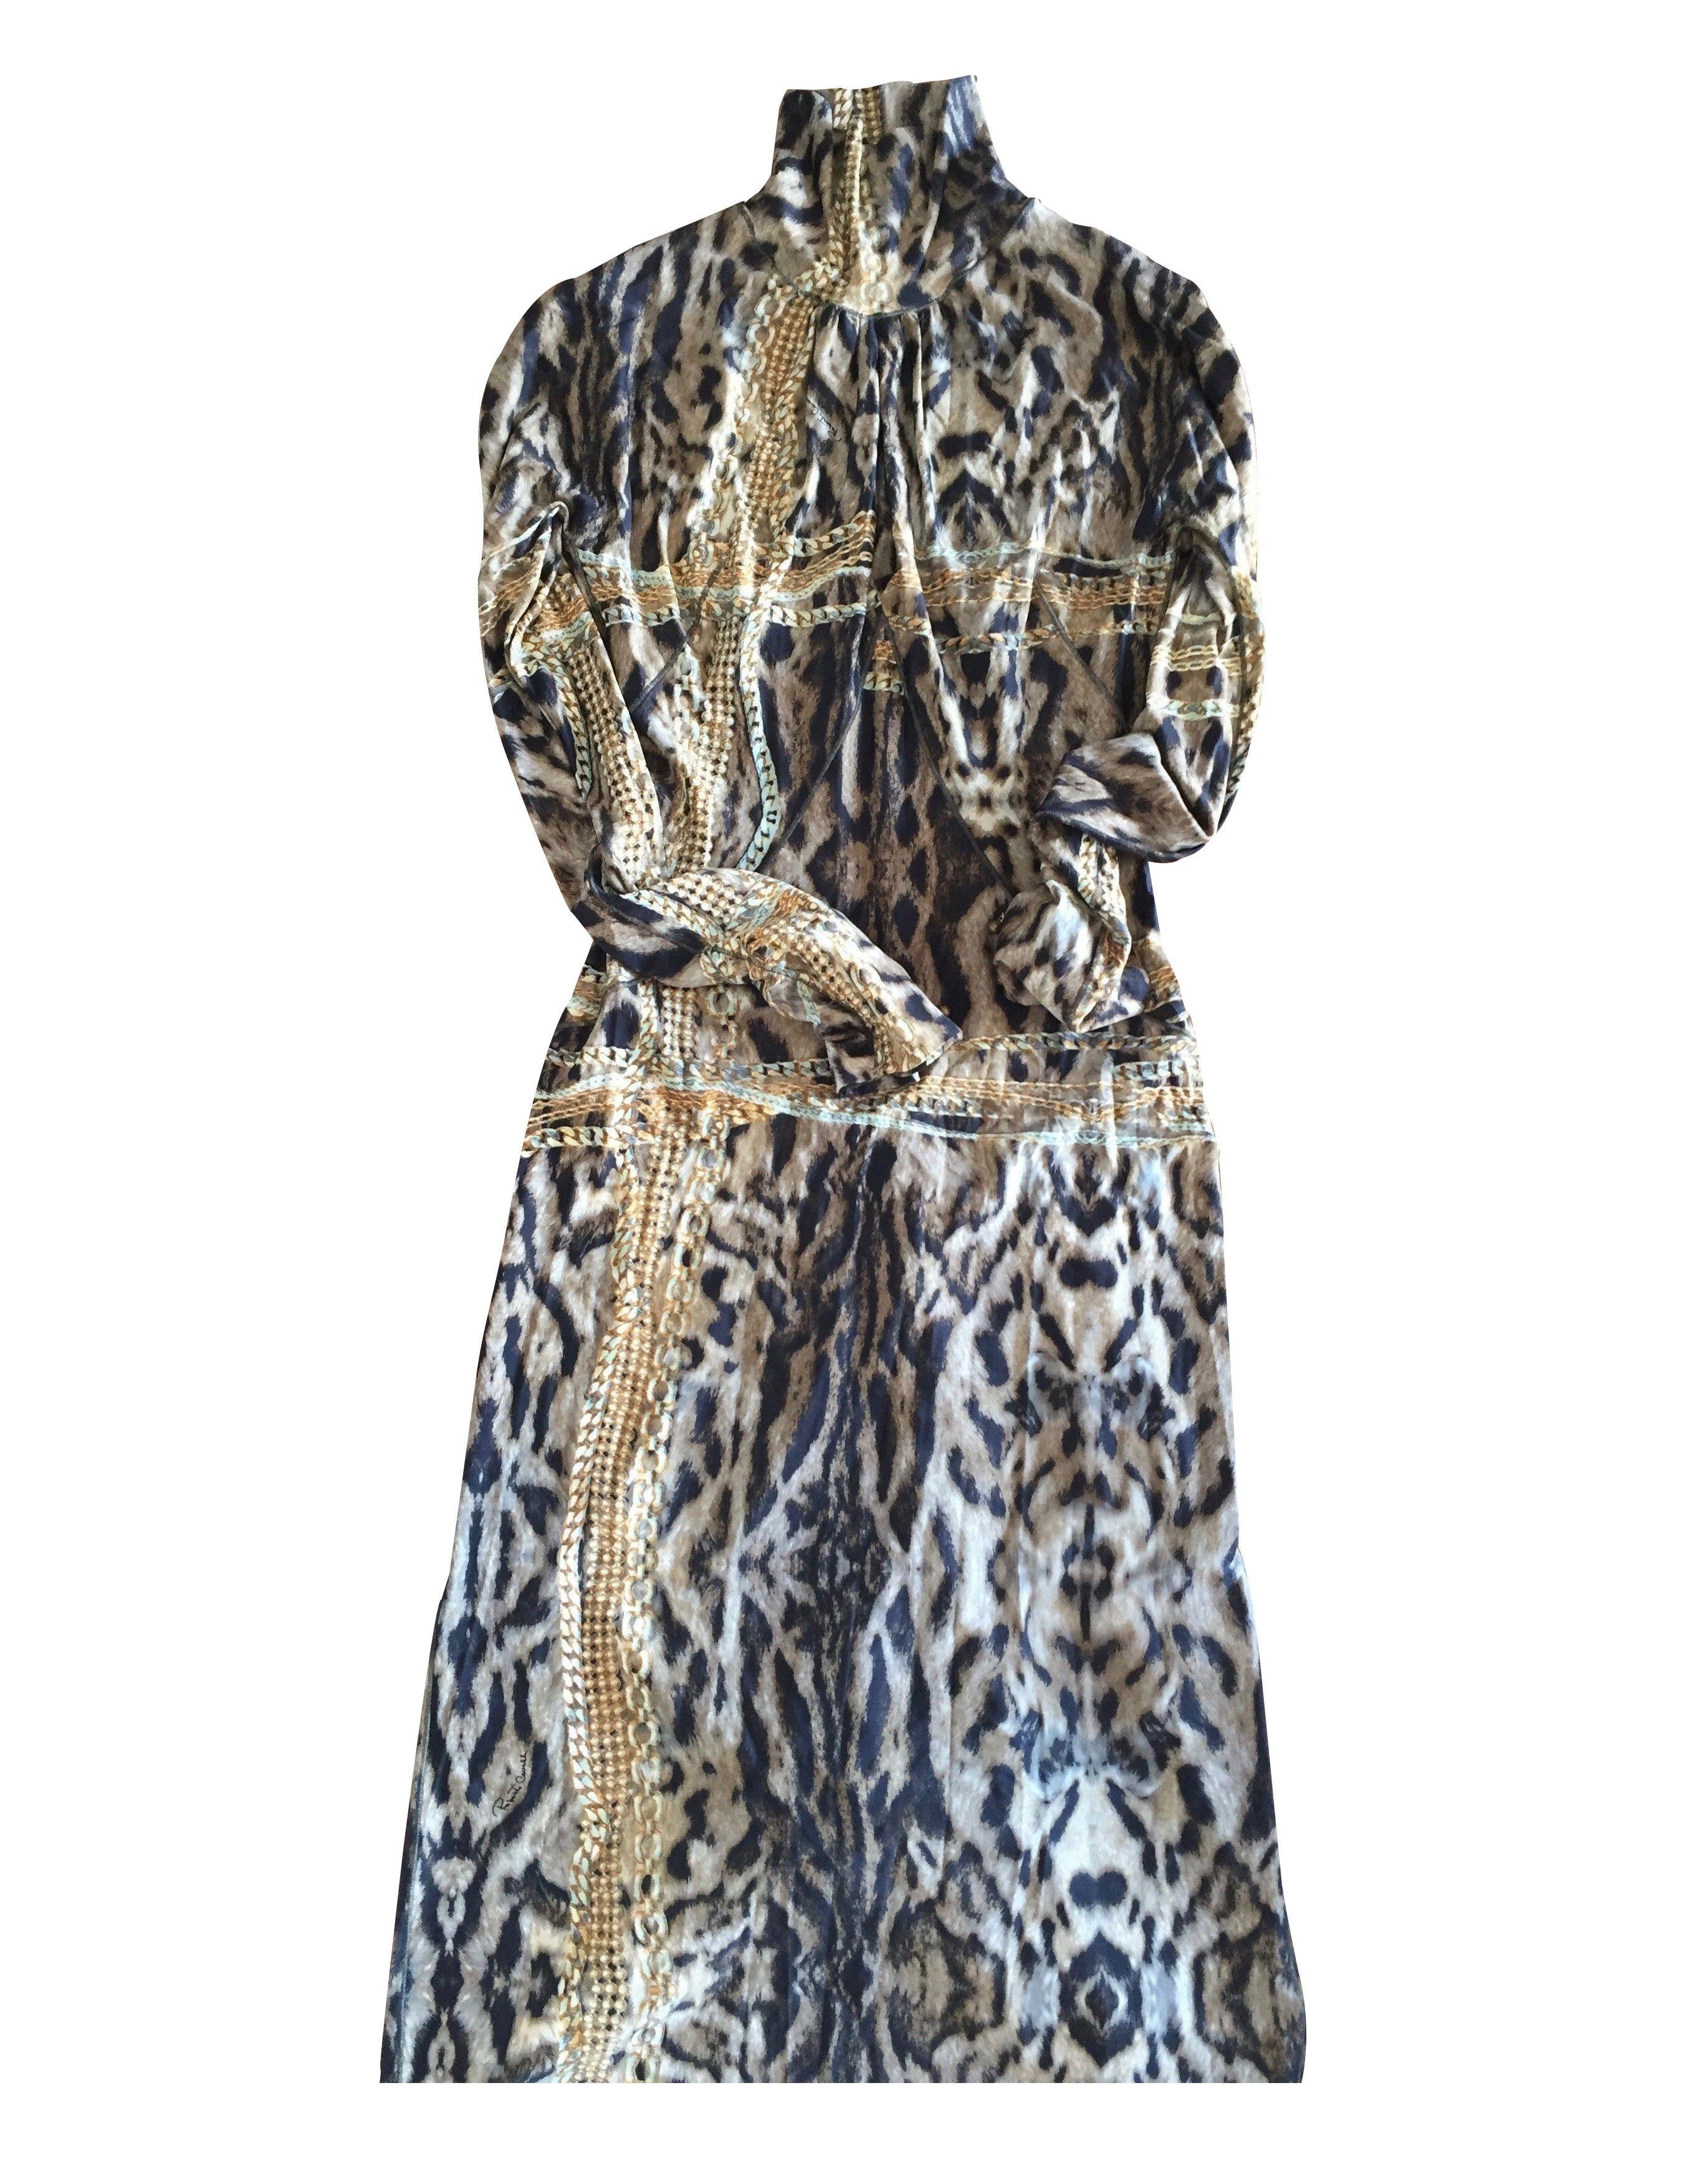 683c4946b91b Dress   Luxury Wanted !!   Kleider